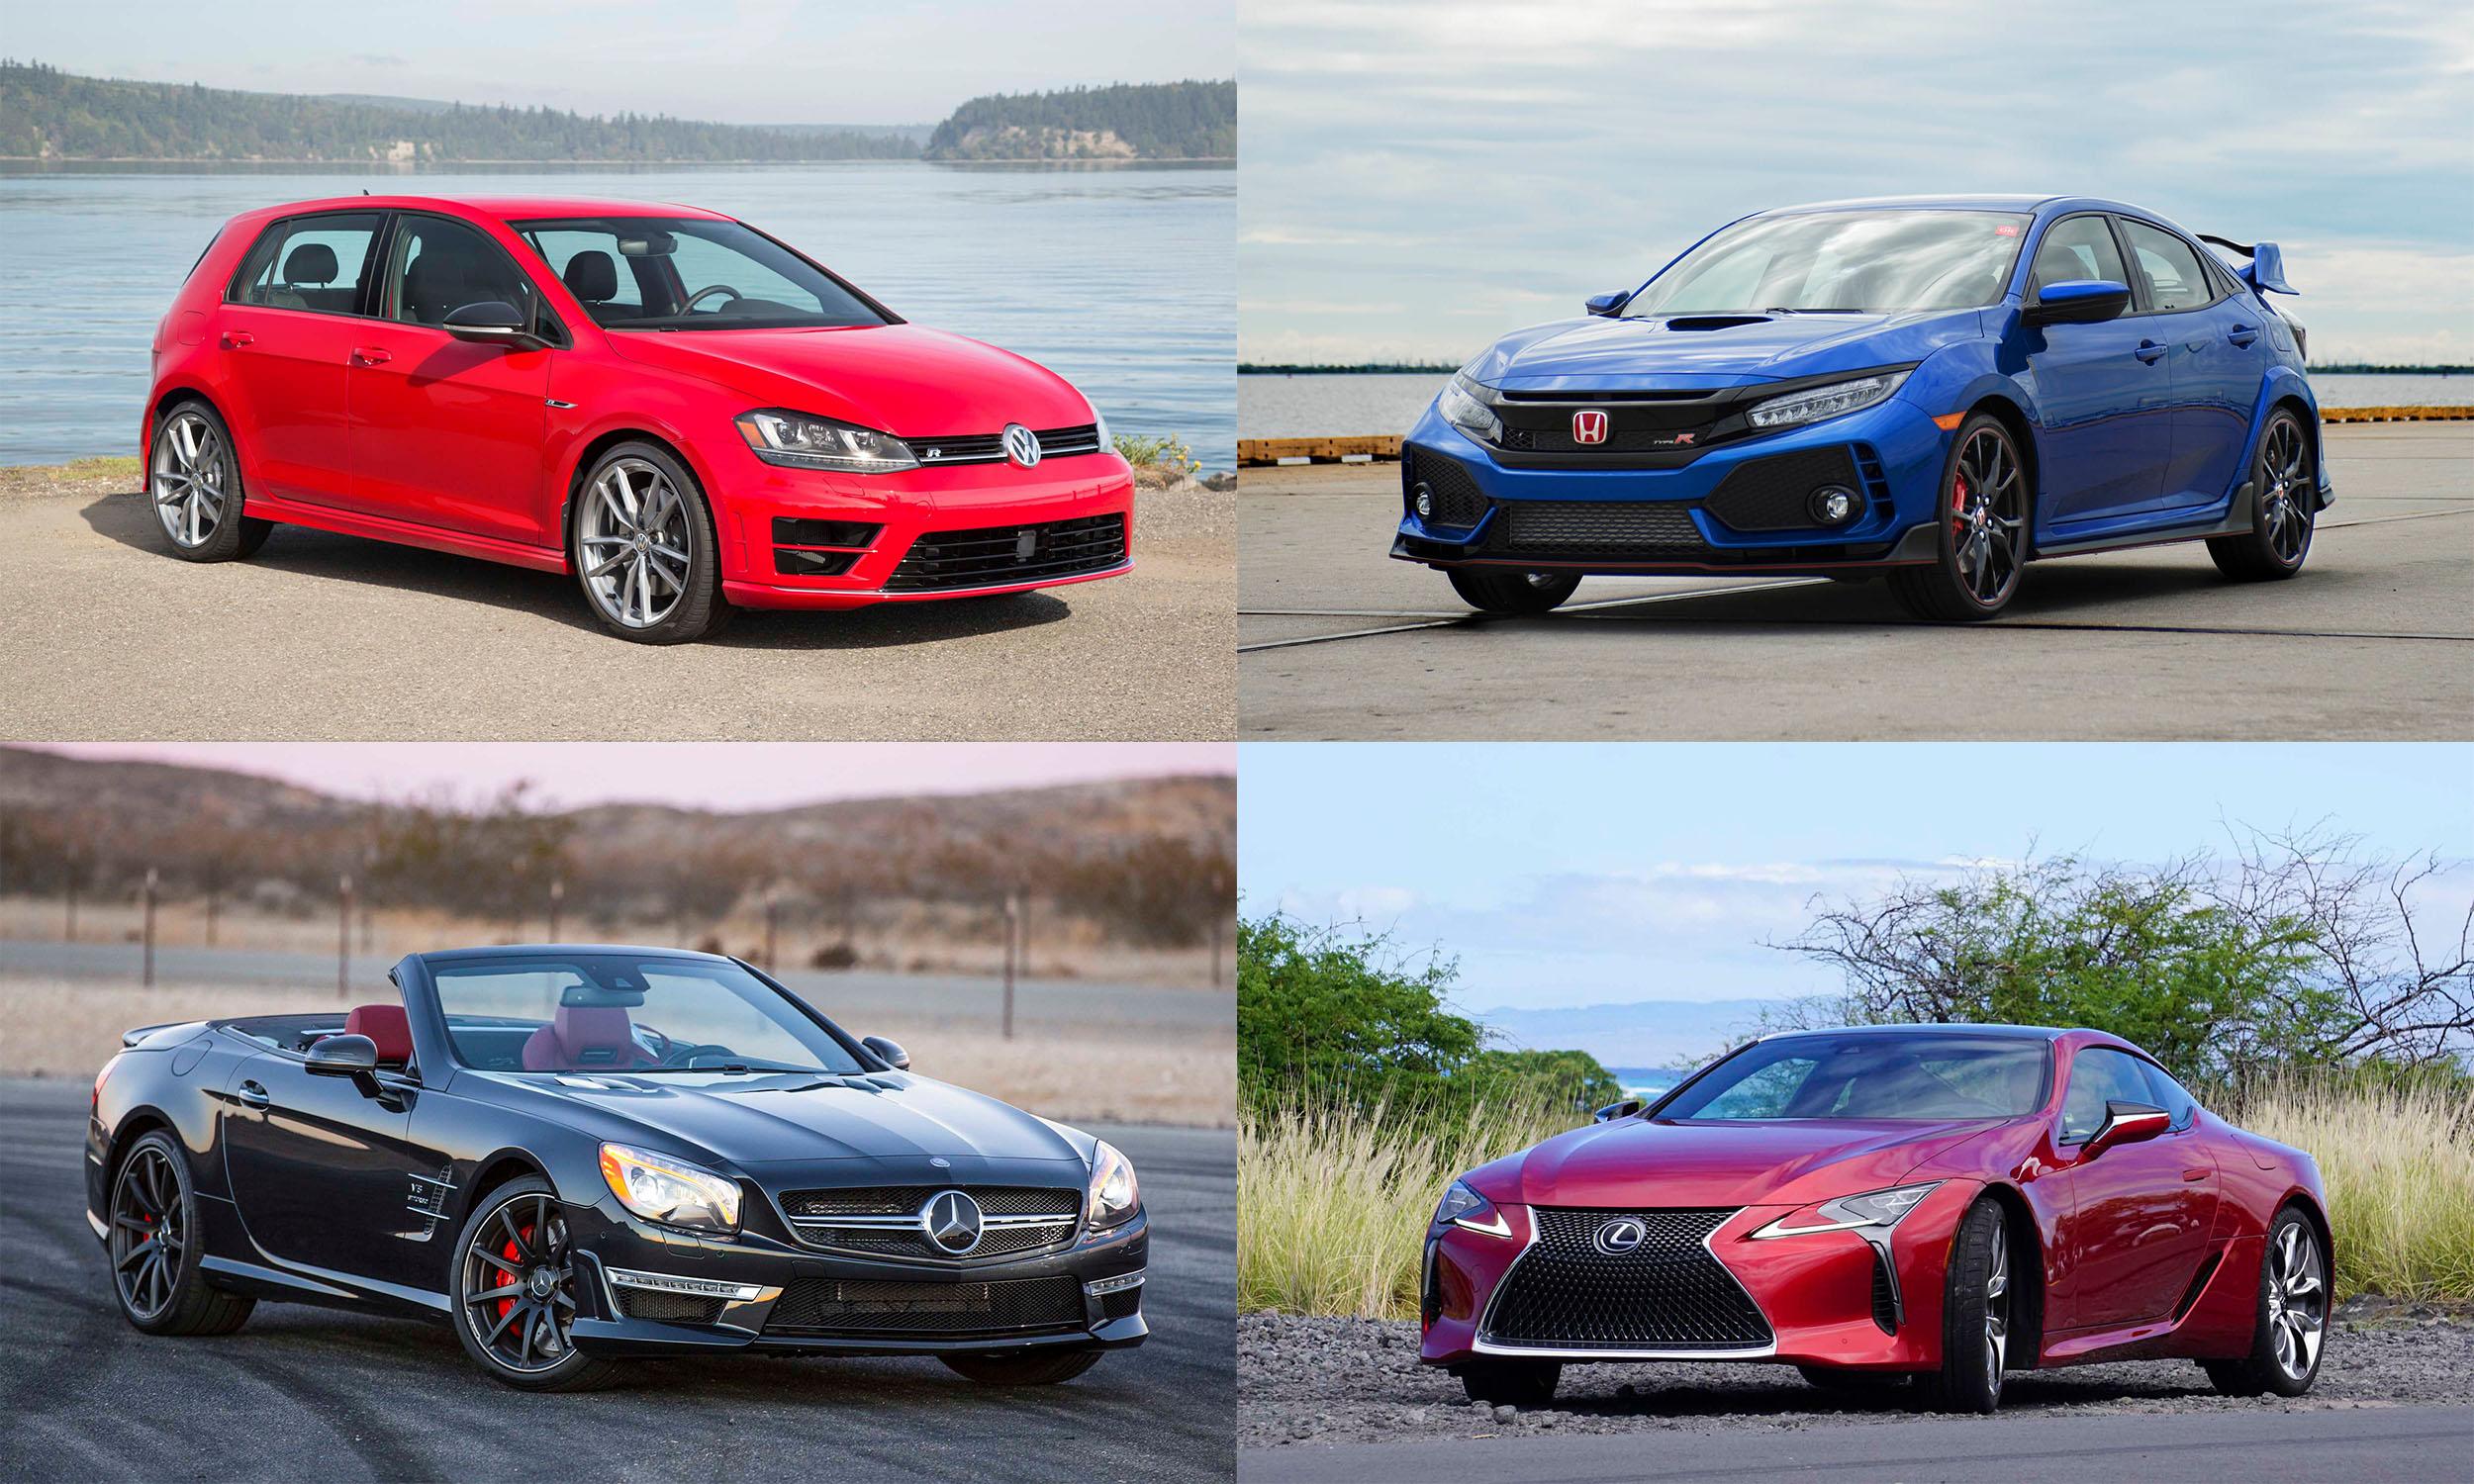 © Volkswagen of America, Inc., American Honda Motor Co., Toyota Motor Sales, U.S.A., Mercedes-Benz USA